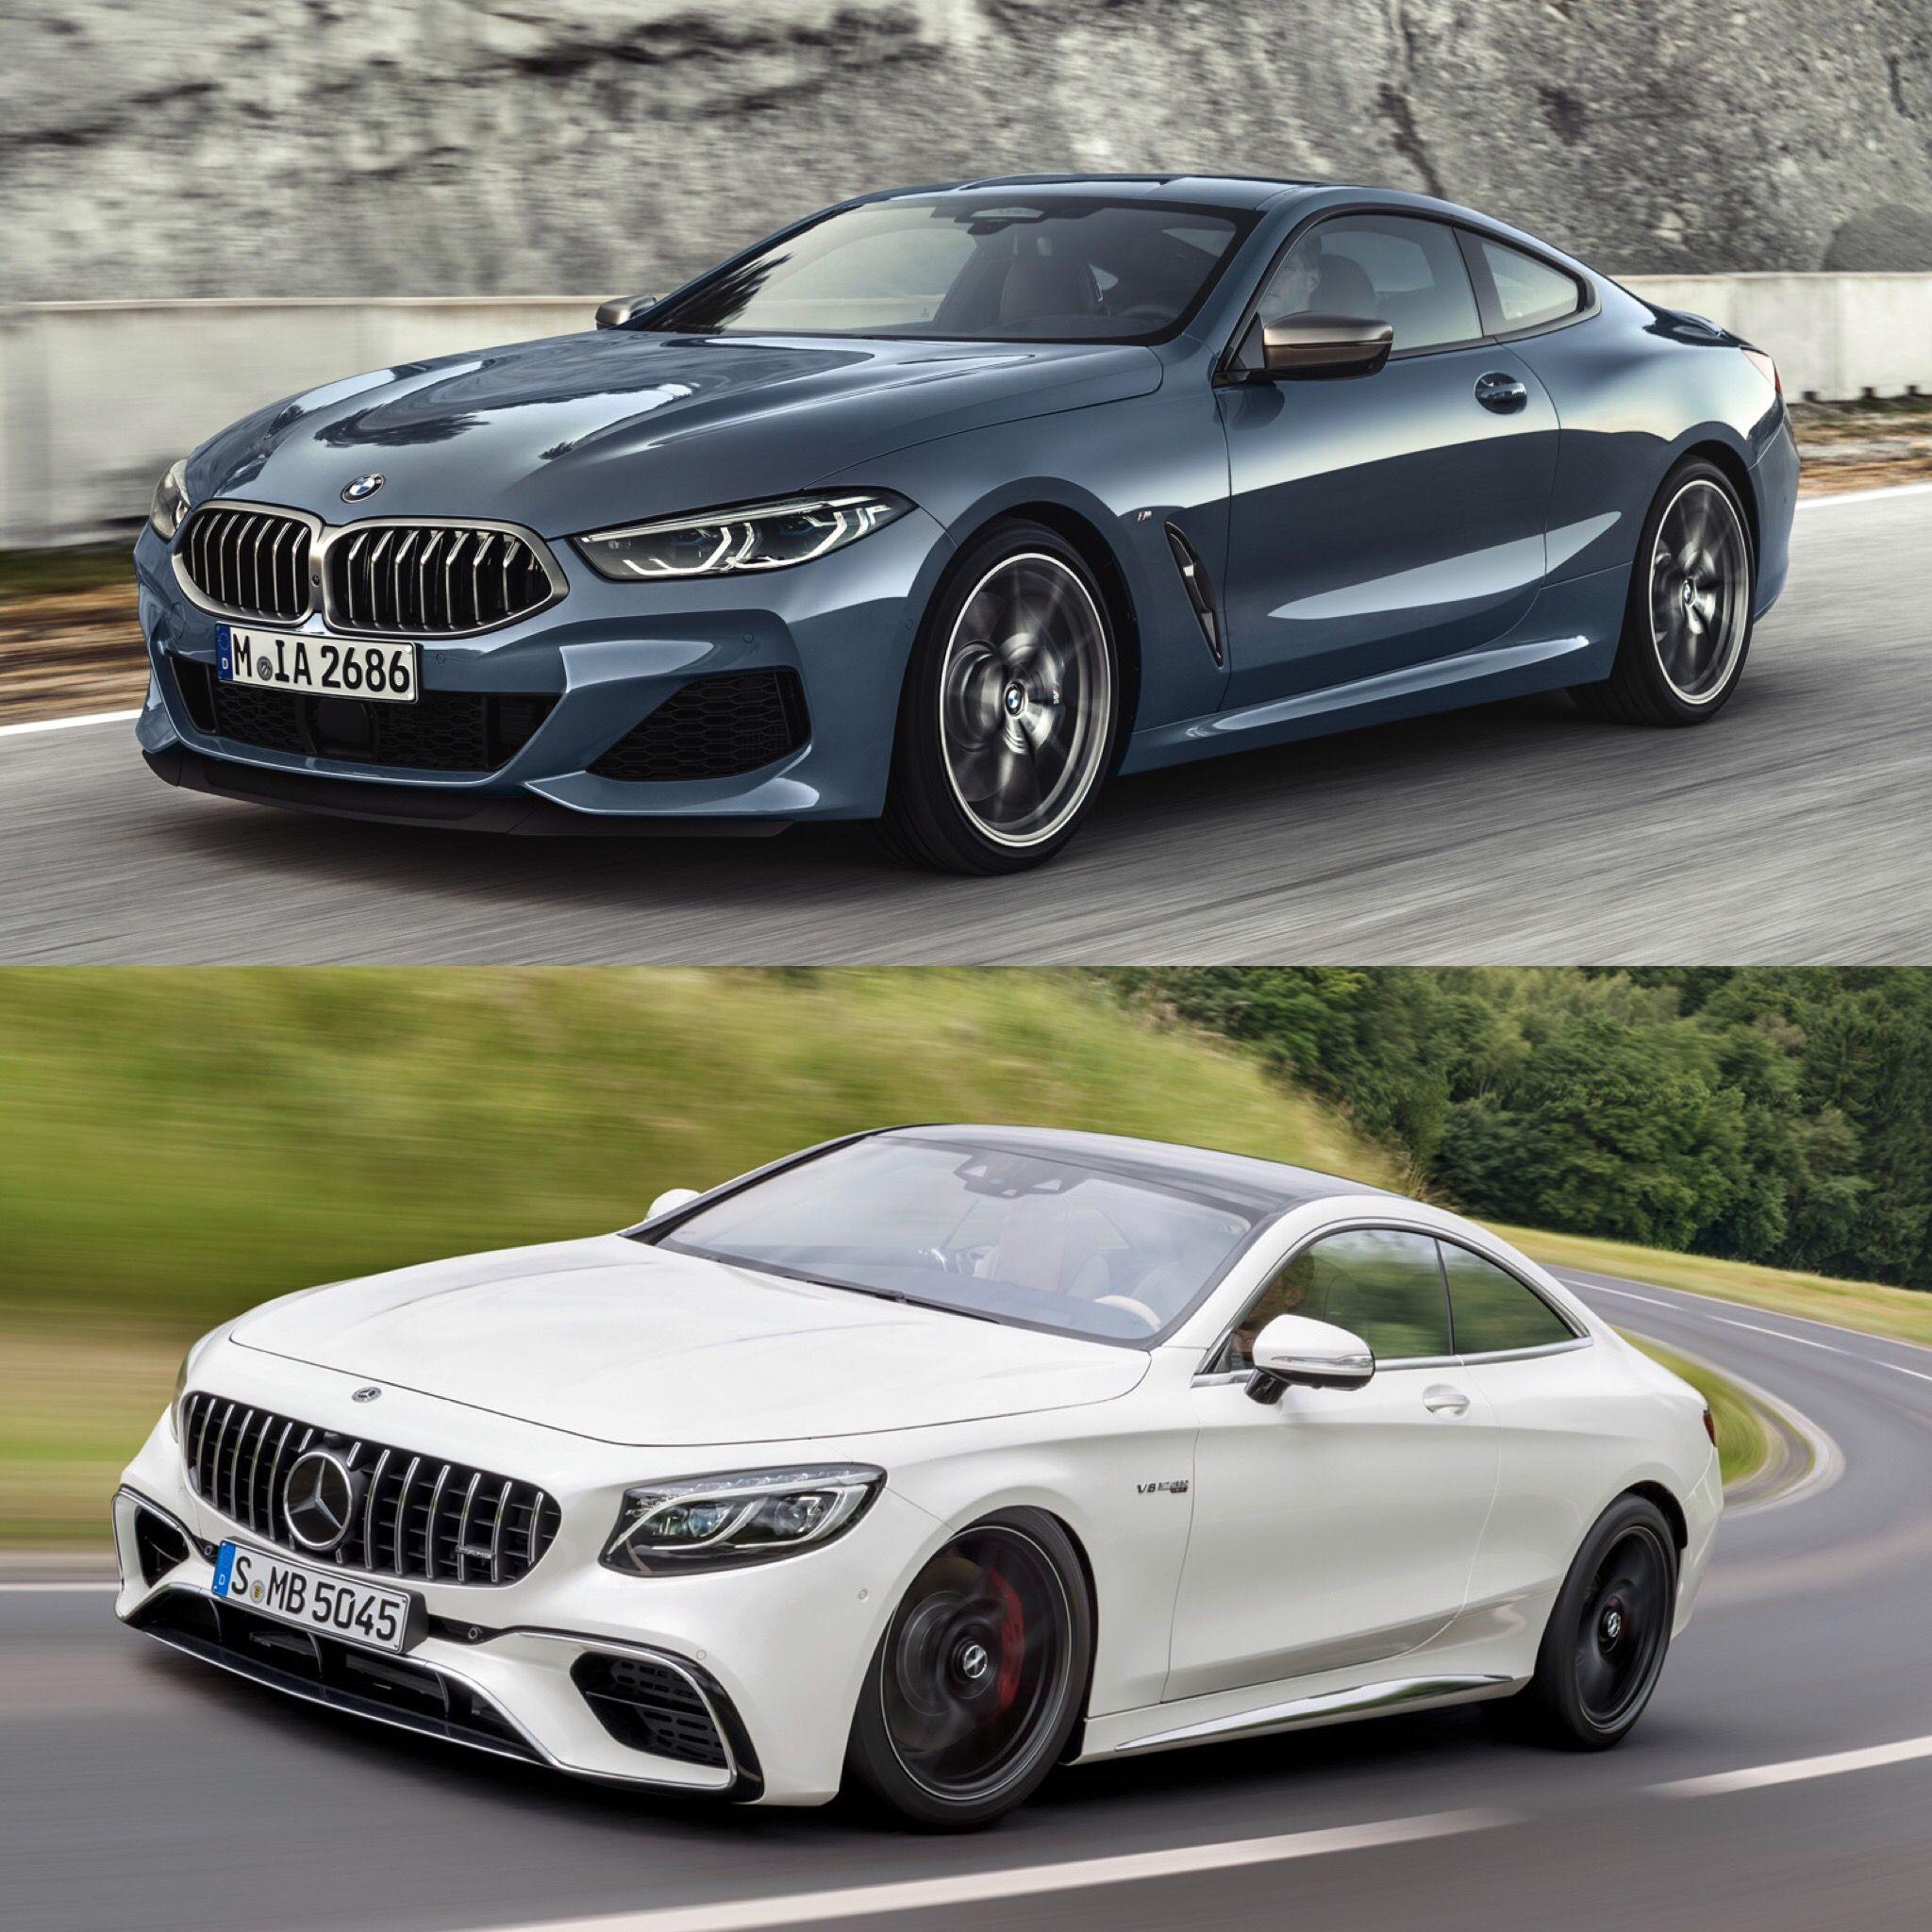 Photo Comparison: BMW M850i Vs Mercedes-AMG S63 Coupe